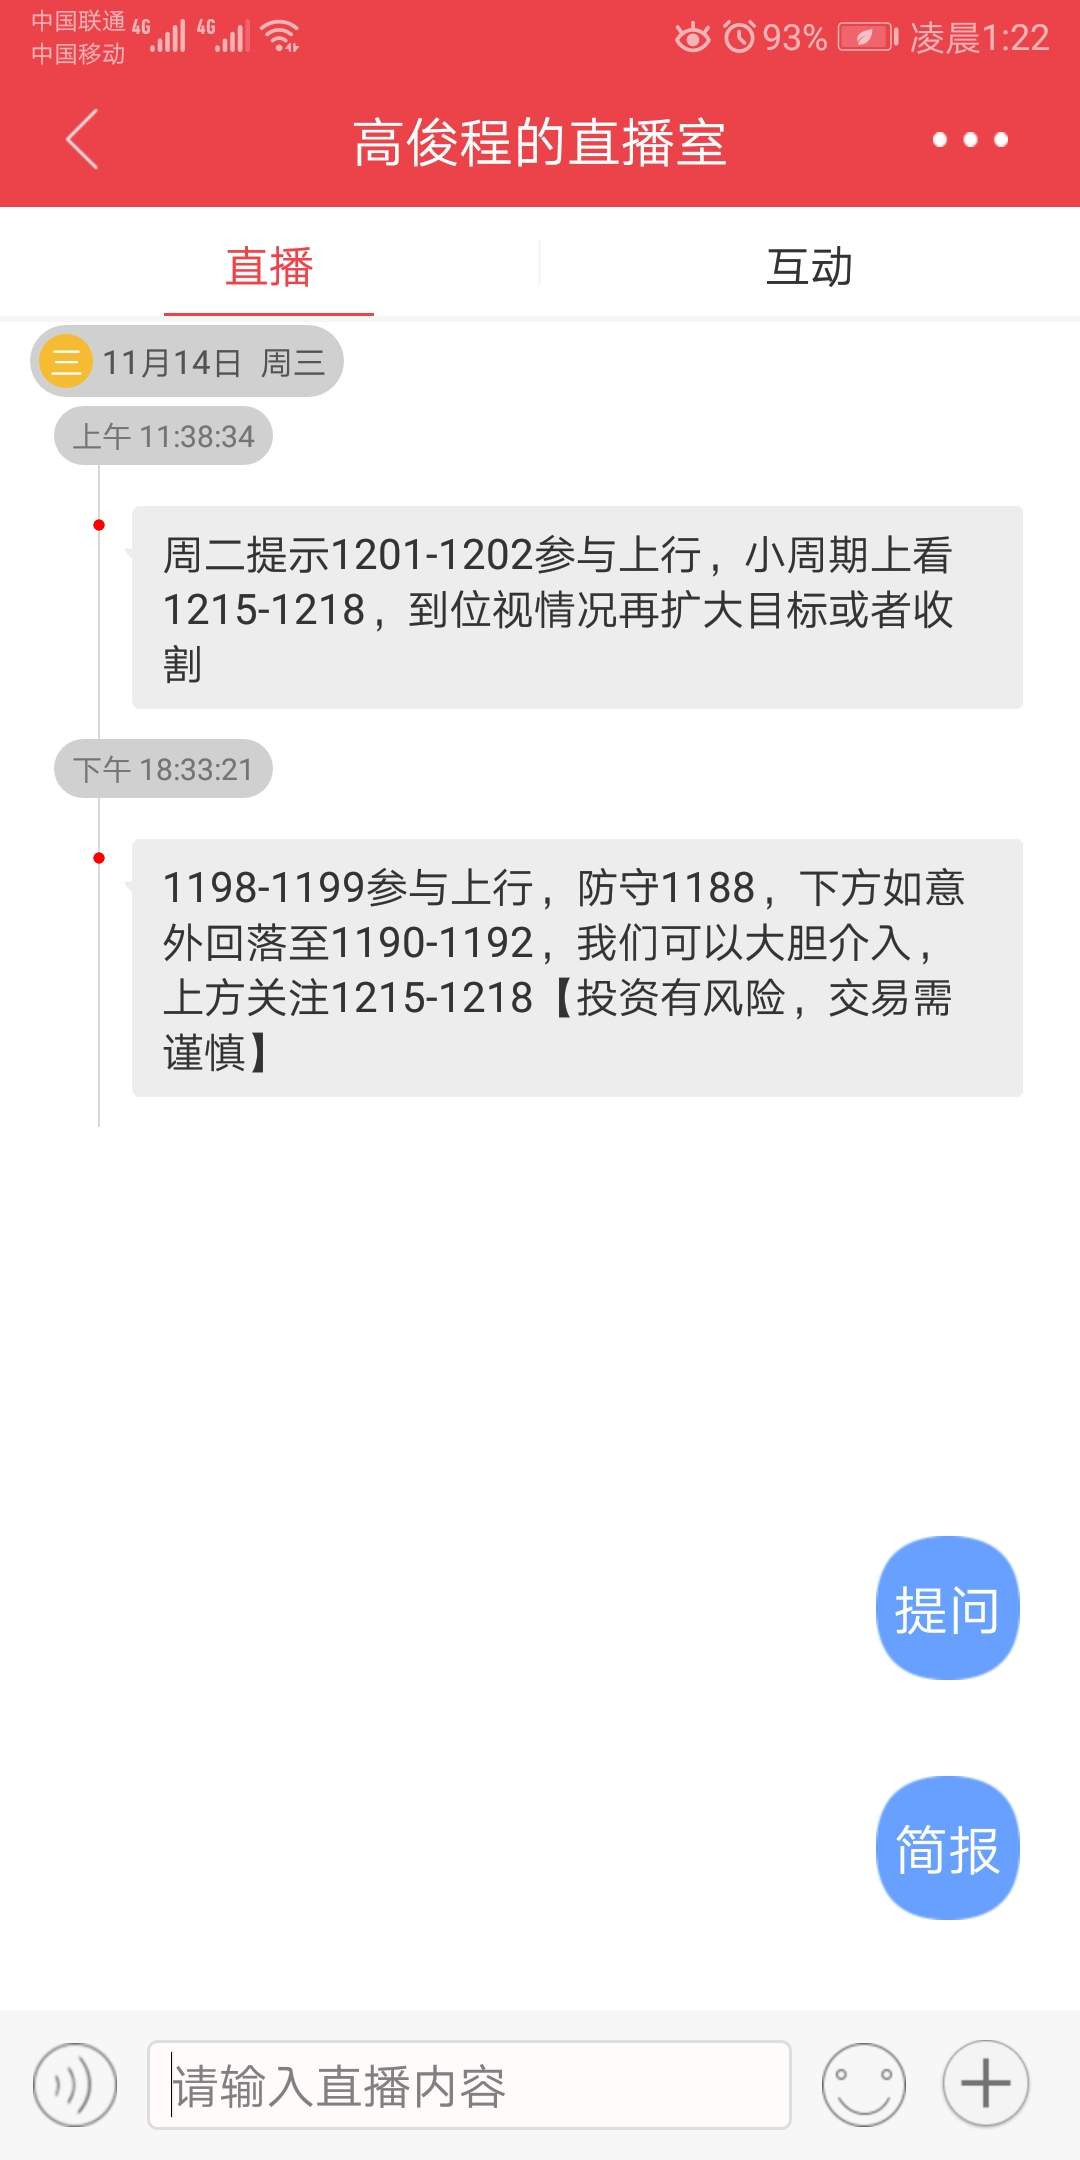 http://gold.cnfol.com/mingjiadianjin/20181116/27029413.shtml